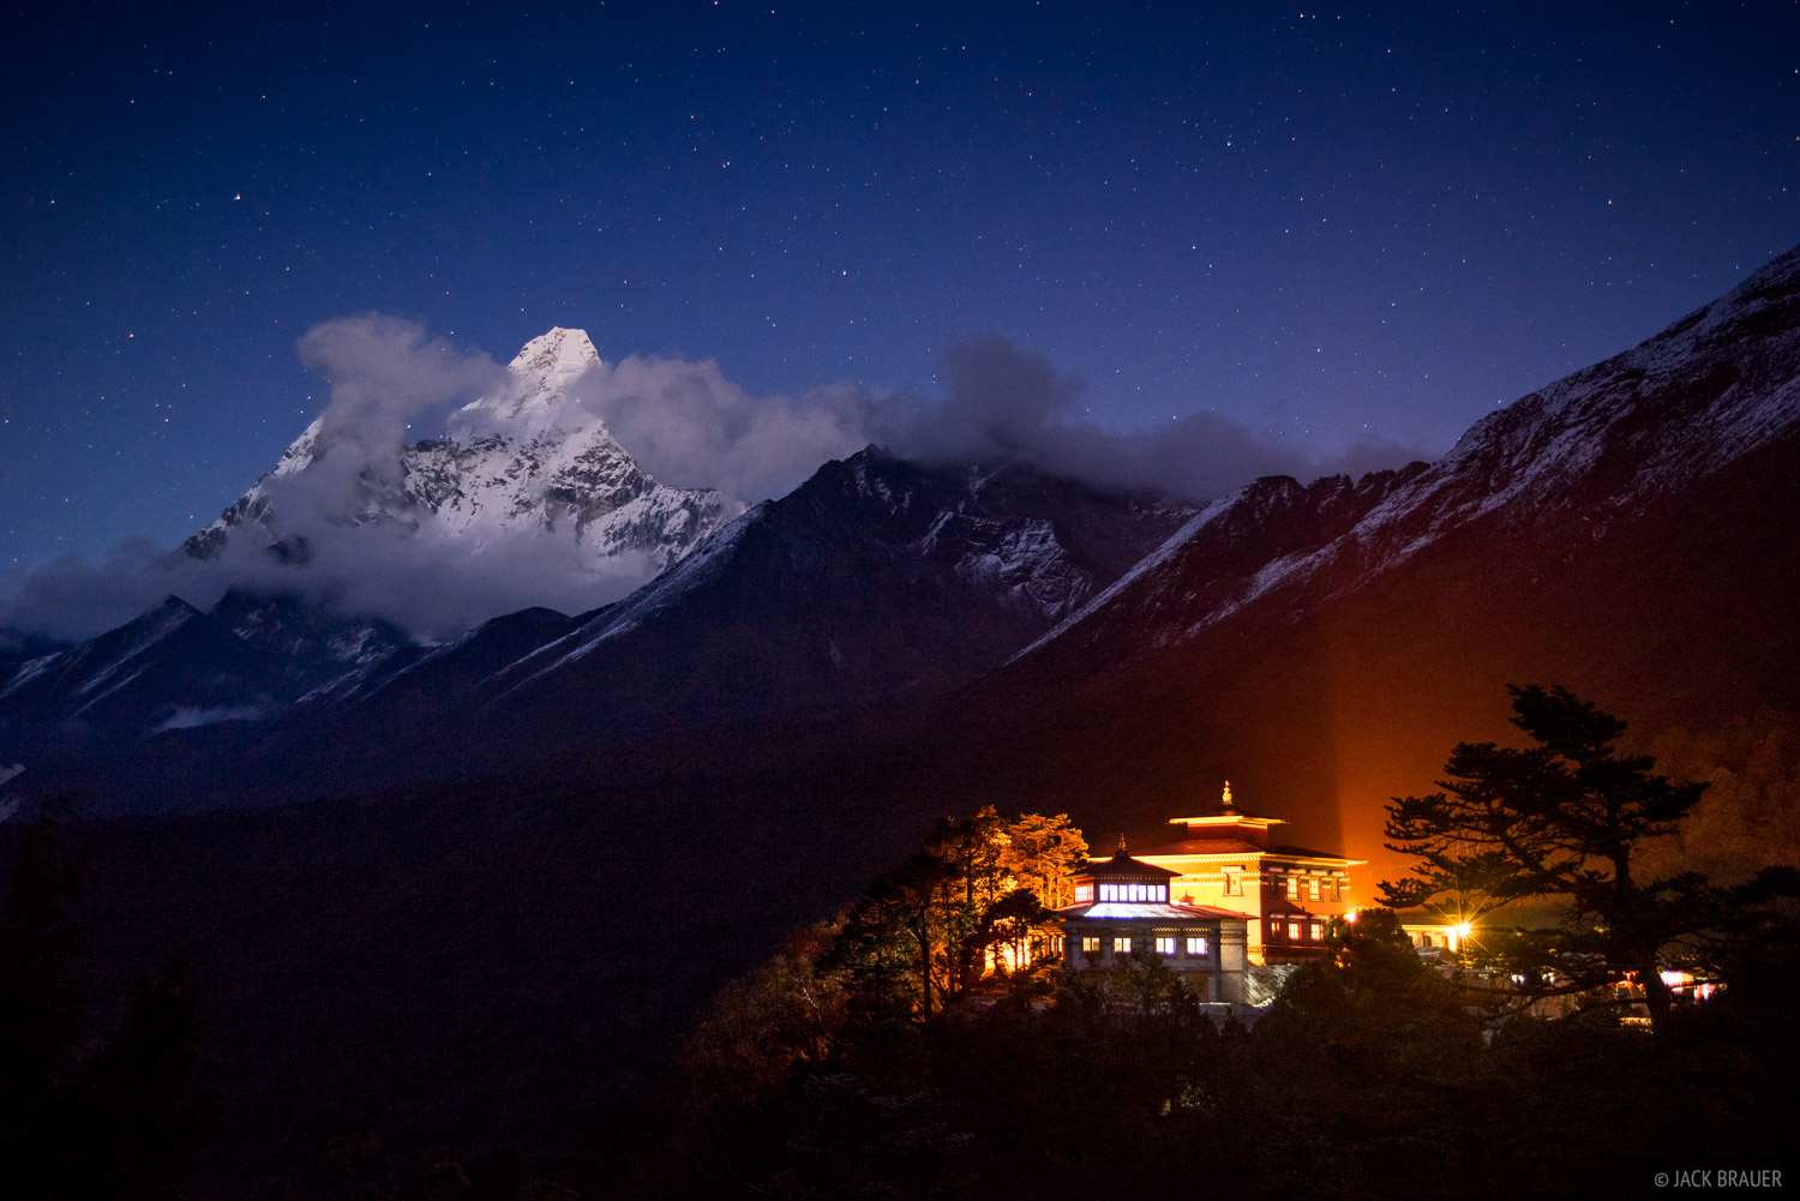 Himalaya,Khumbu,Nepal,Tengboche, Ama Dablam, monastery, photo